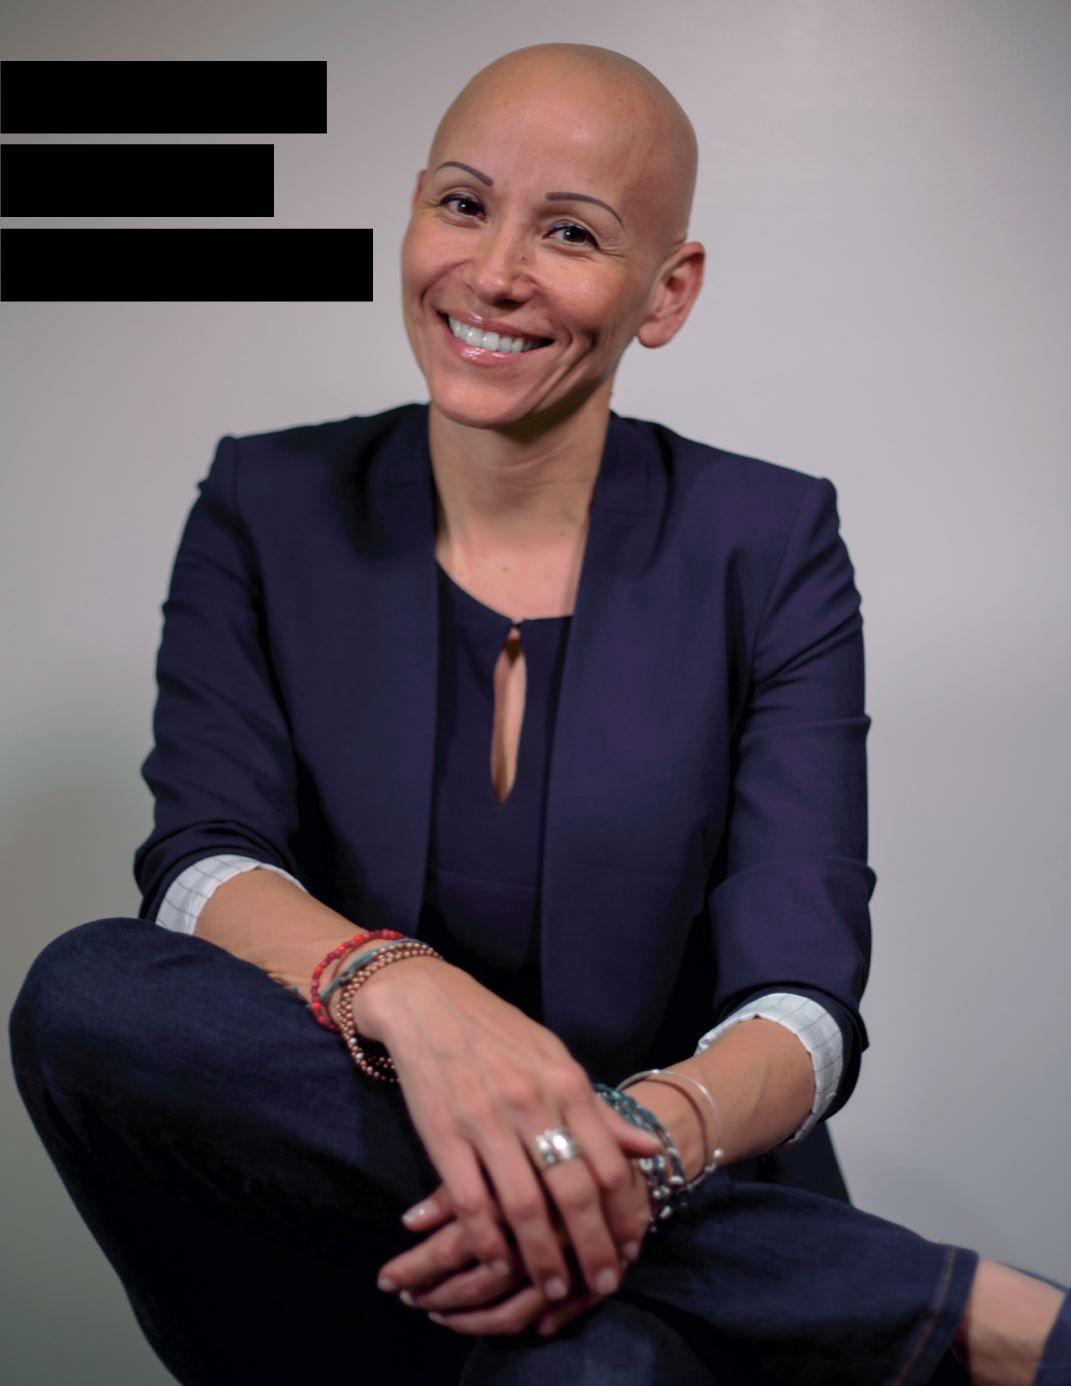 Entrevista A Karla Ruiz Cofino Como Persona De Exito Por Revista